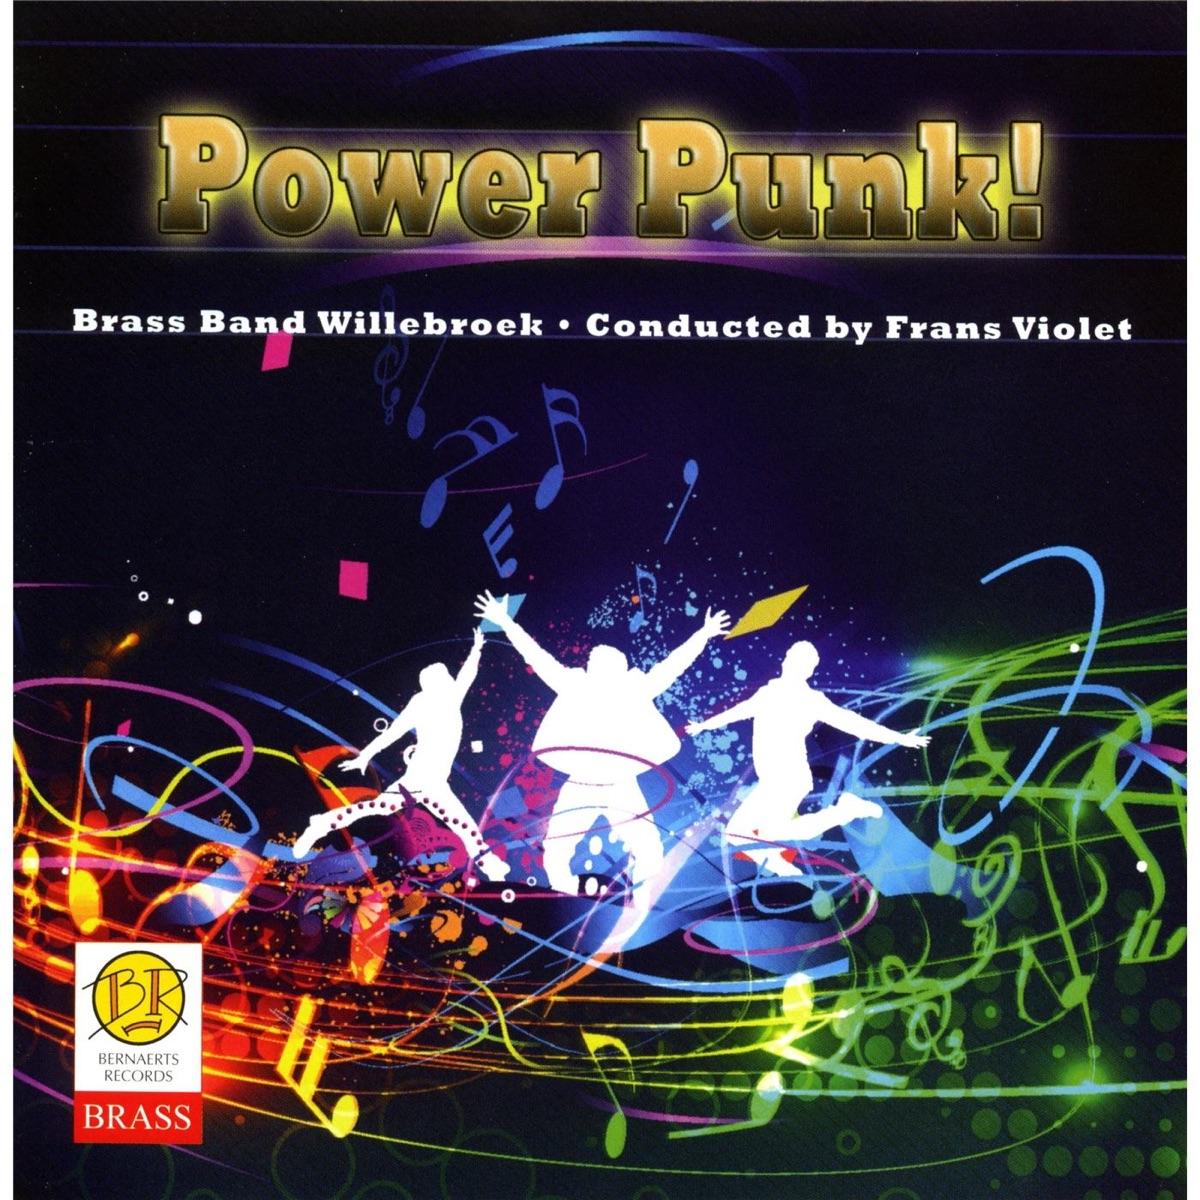 Power Punk Brass Band Willebroek CD cover